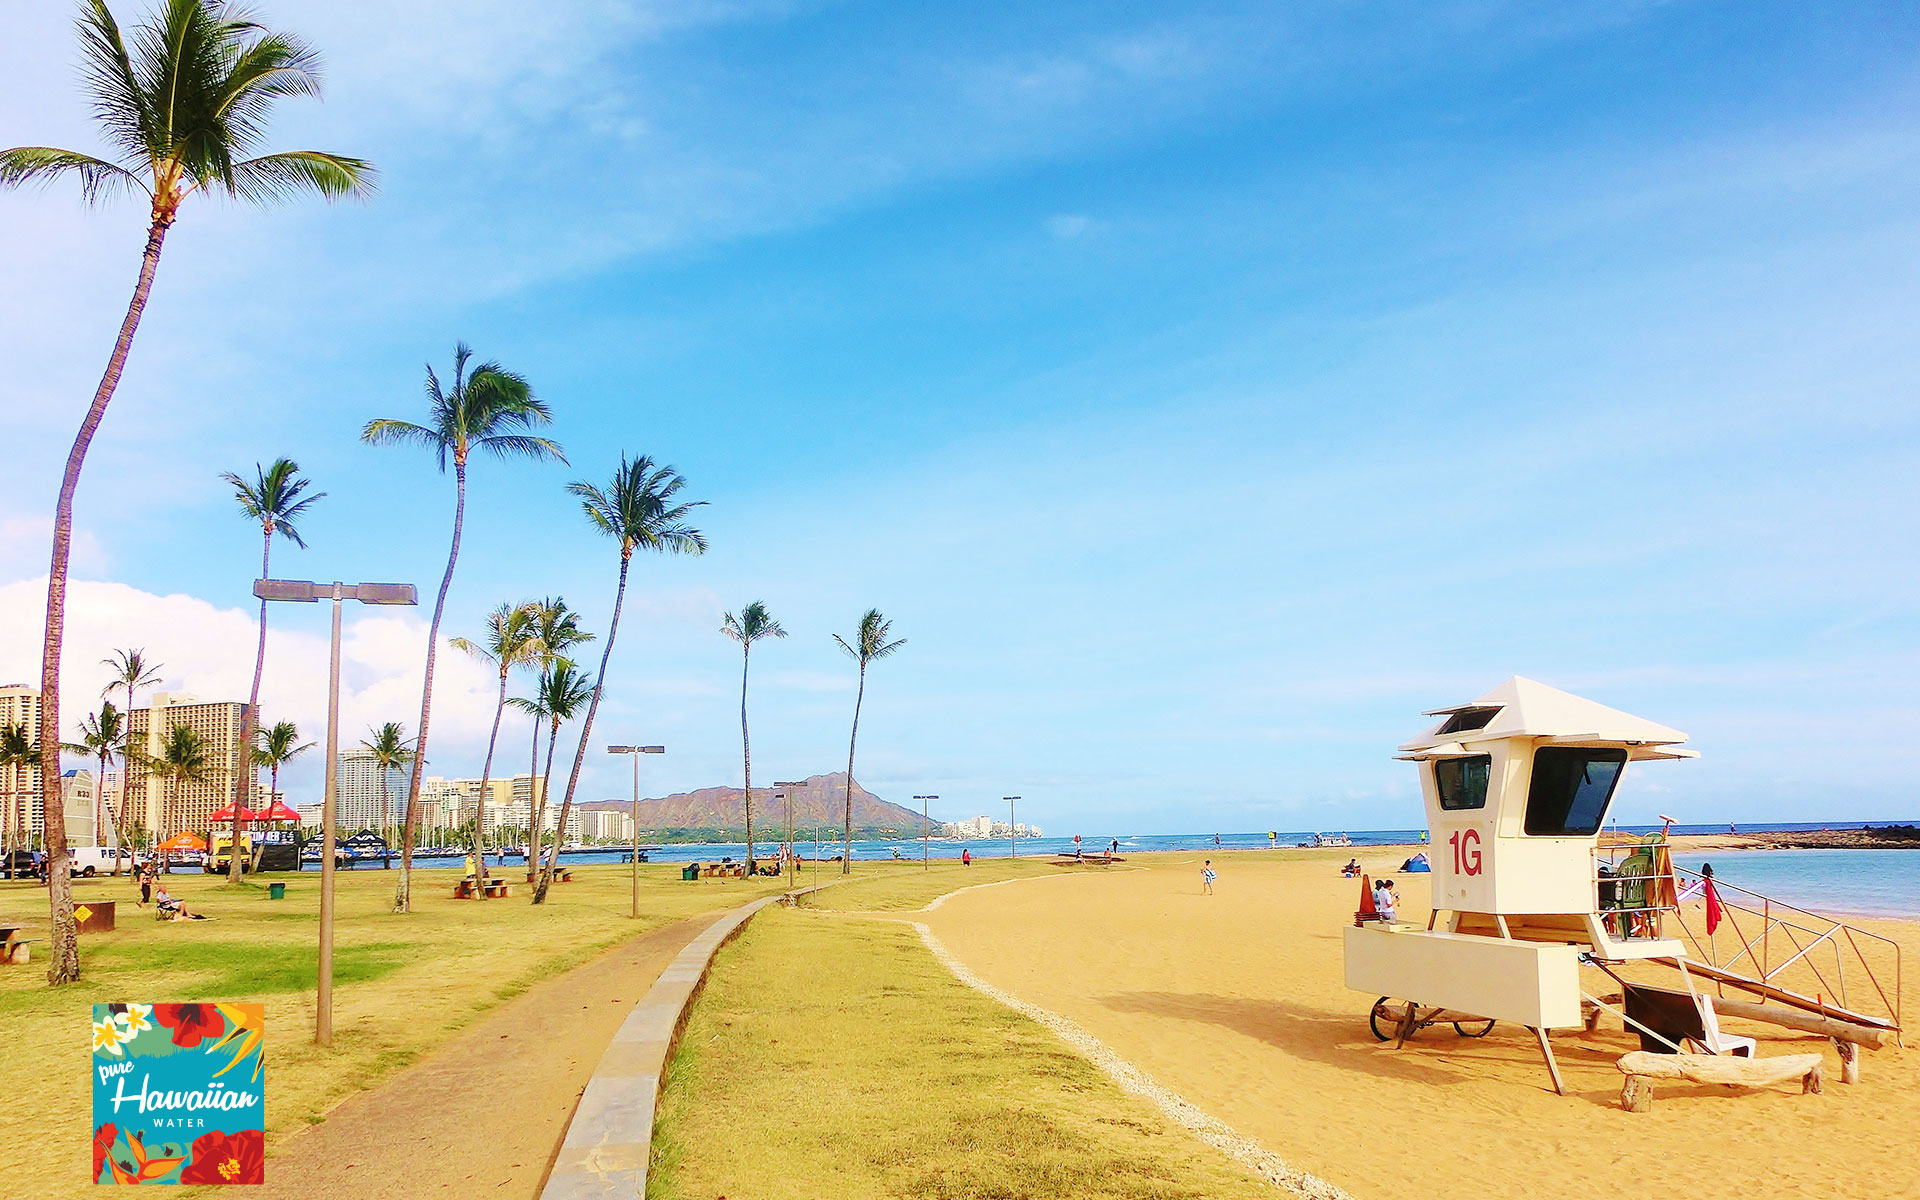 Hawaii Wallpapers ピュアハワイアン